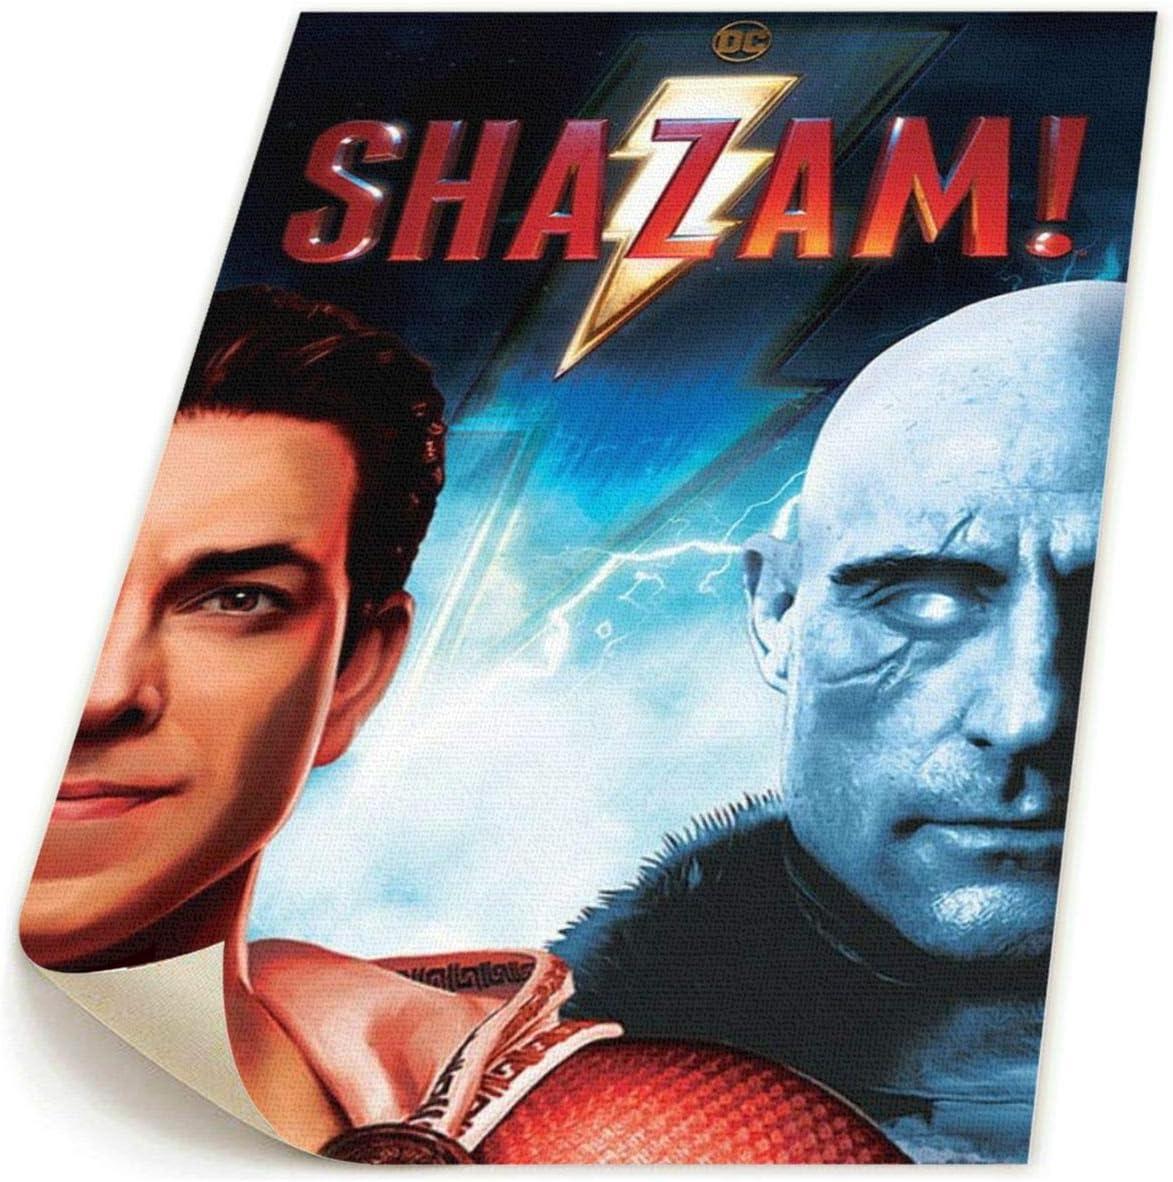 High Quality Prints Shazam Movie Poster 2019 Movie